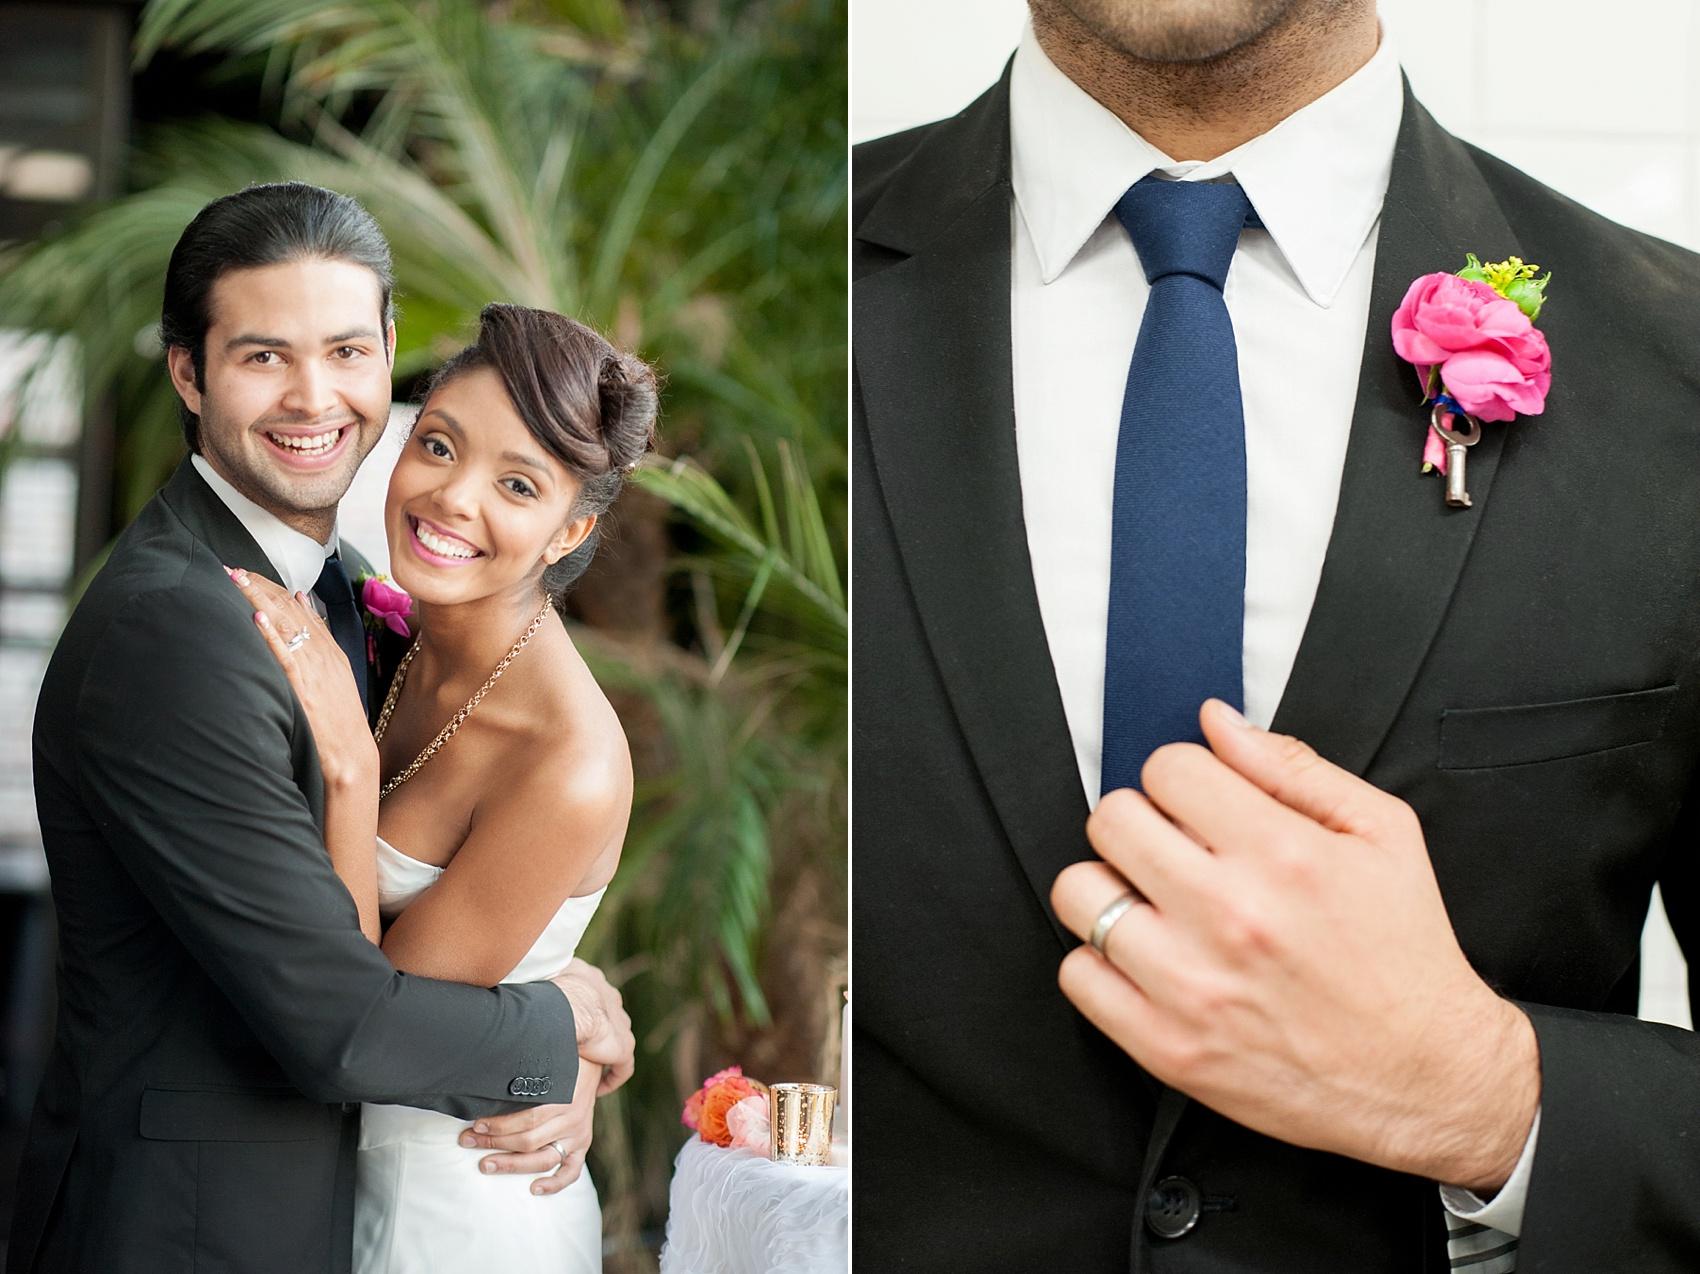 Forever Linked, Ponts des Arts, Lock and Key Wedding Ideas ...